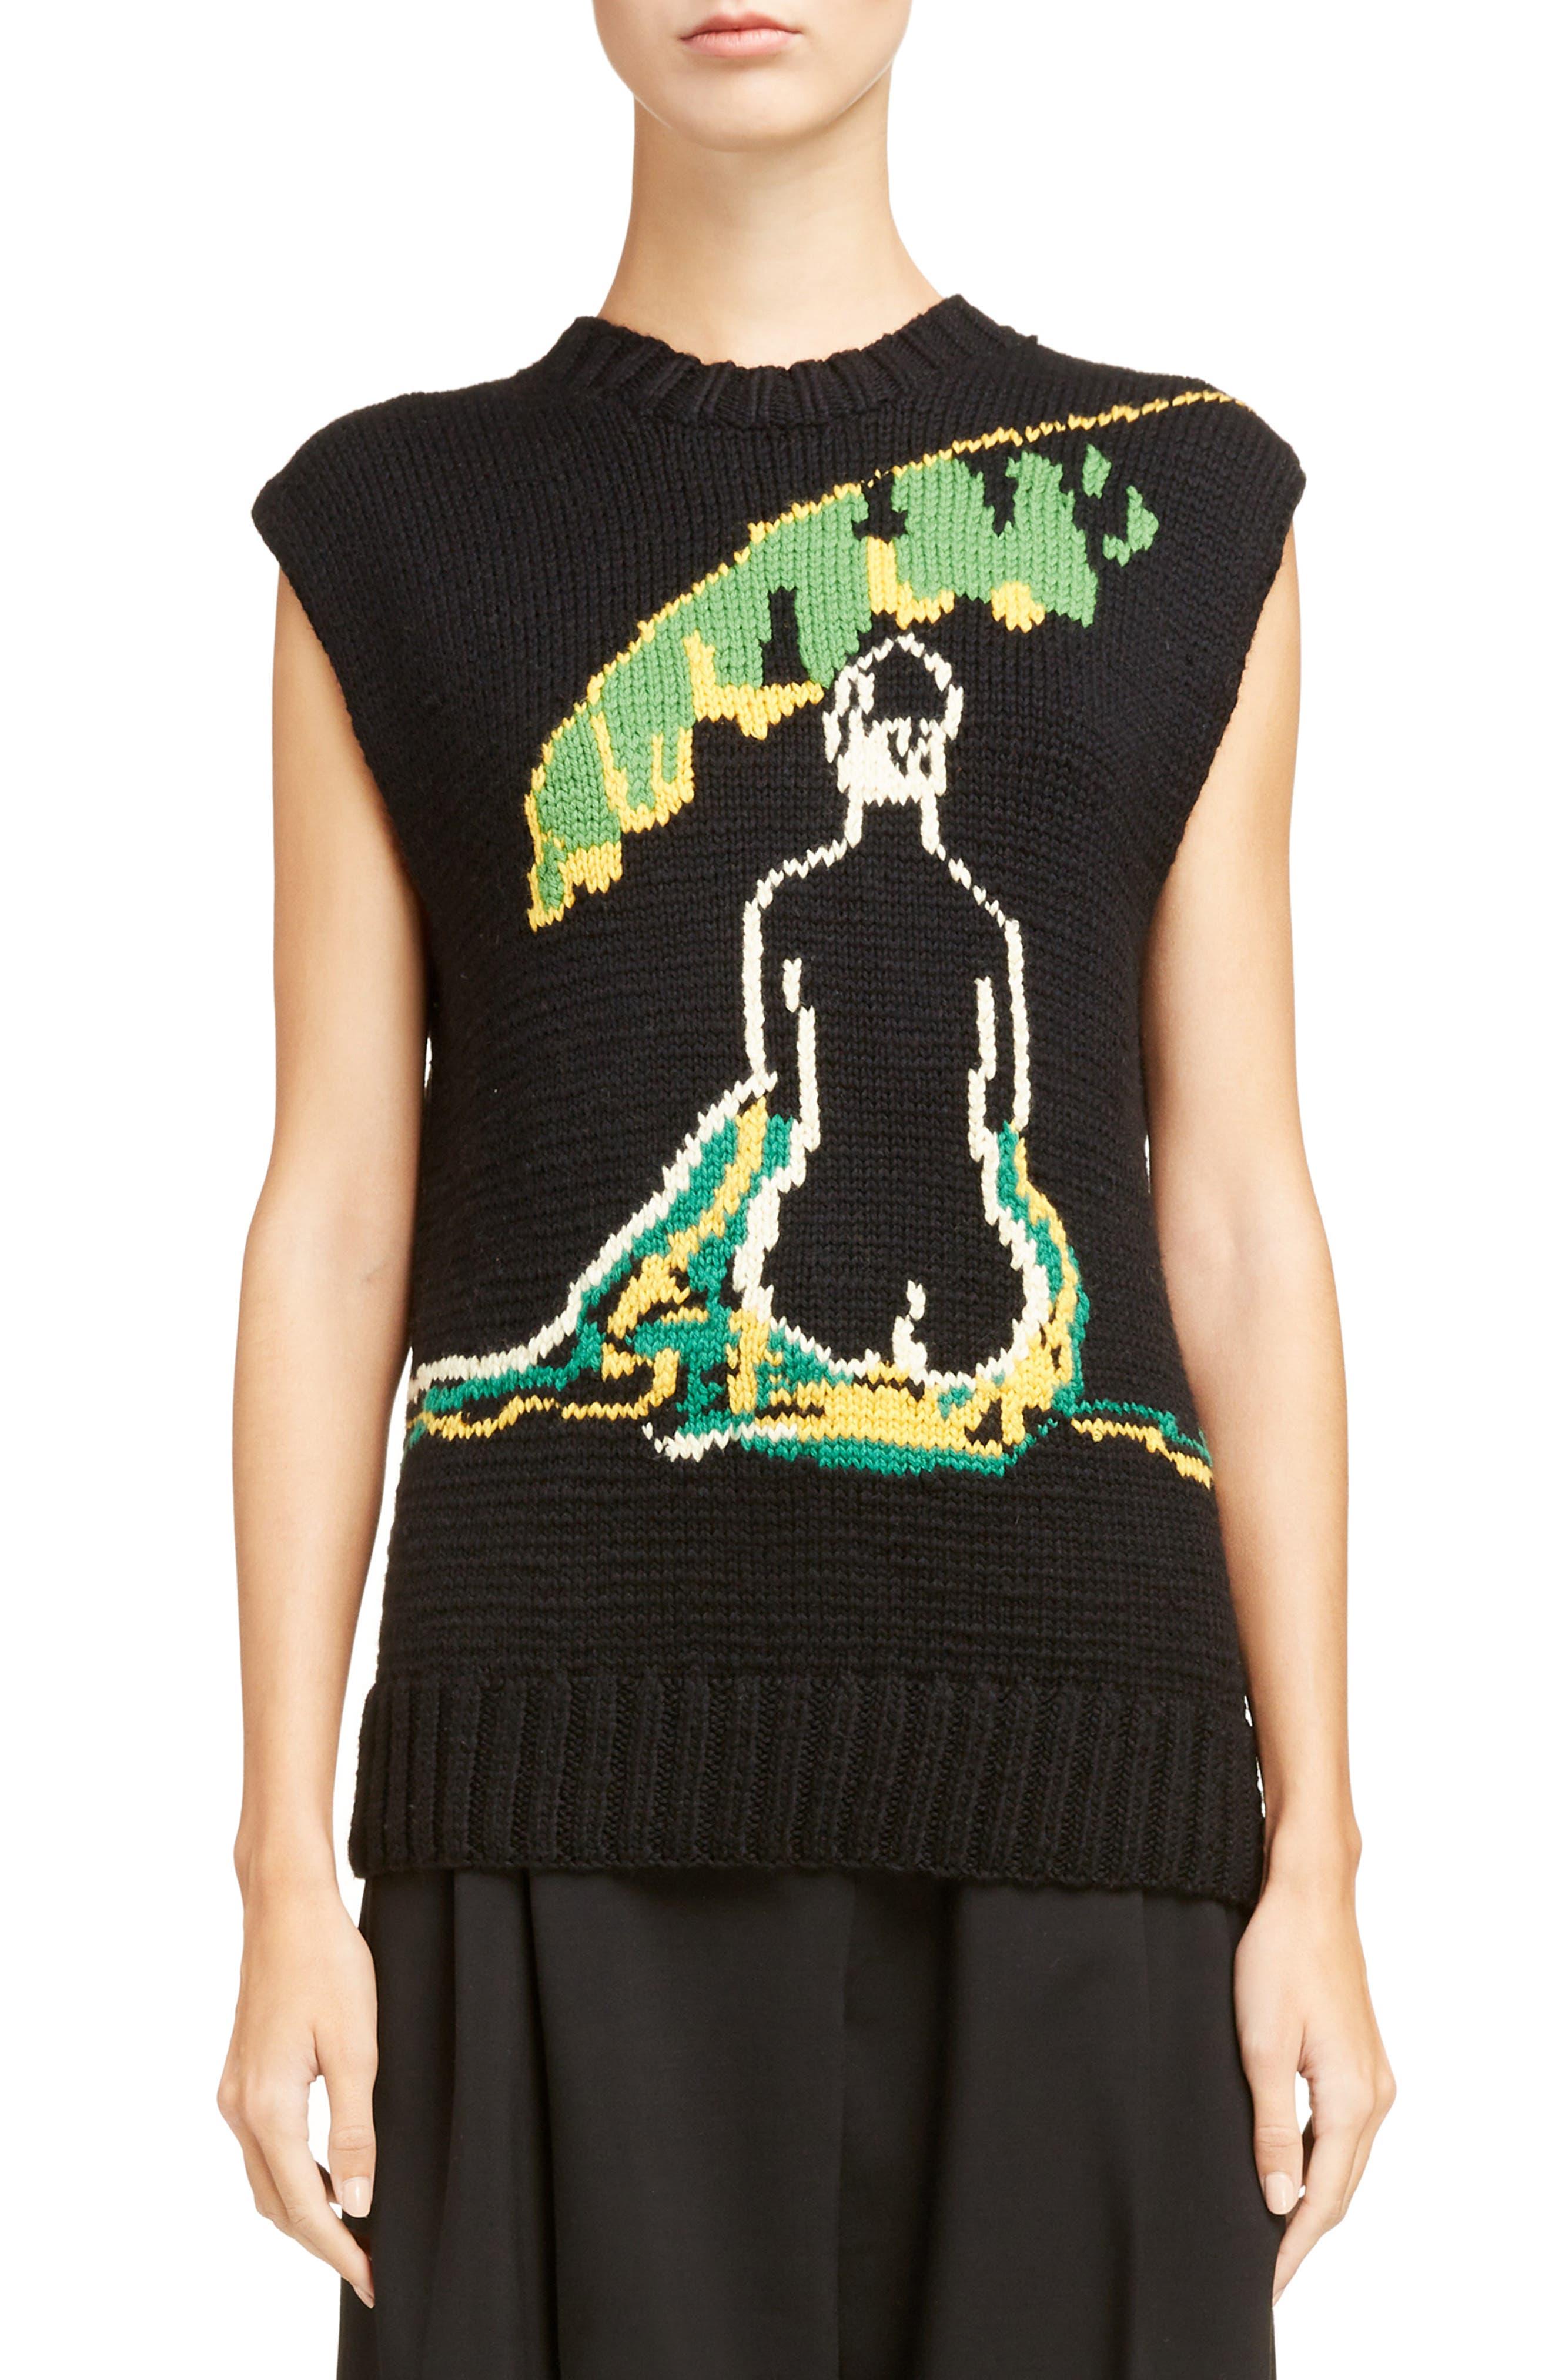 Palm Lady Sweater Tank,                             Main thumbnail 1, color,                             Black